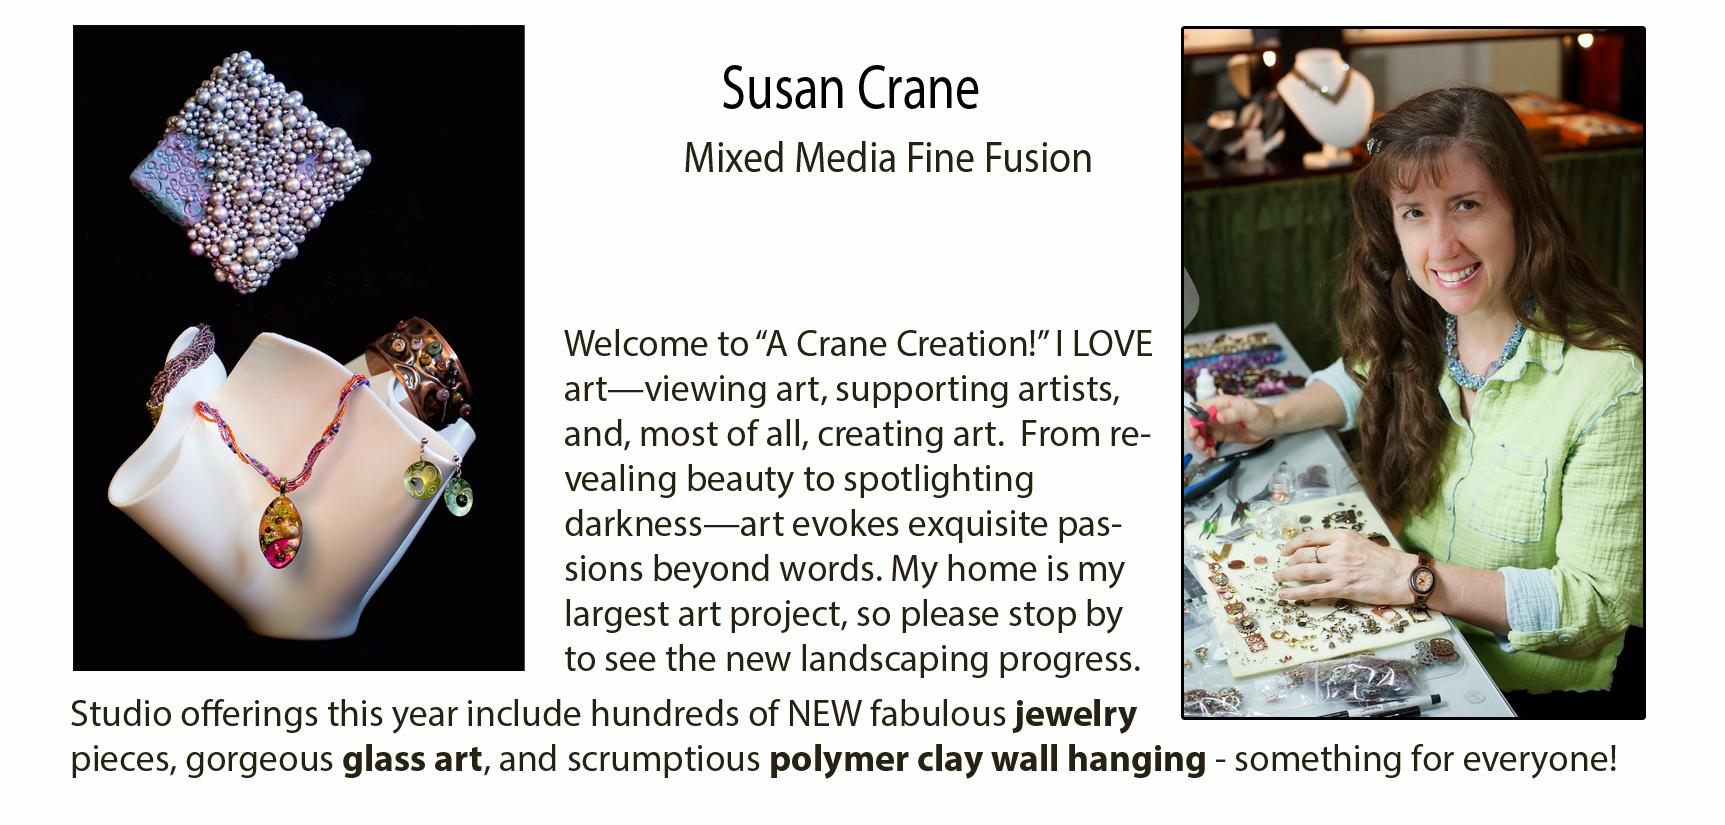 Susan profile for FB.jpg